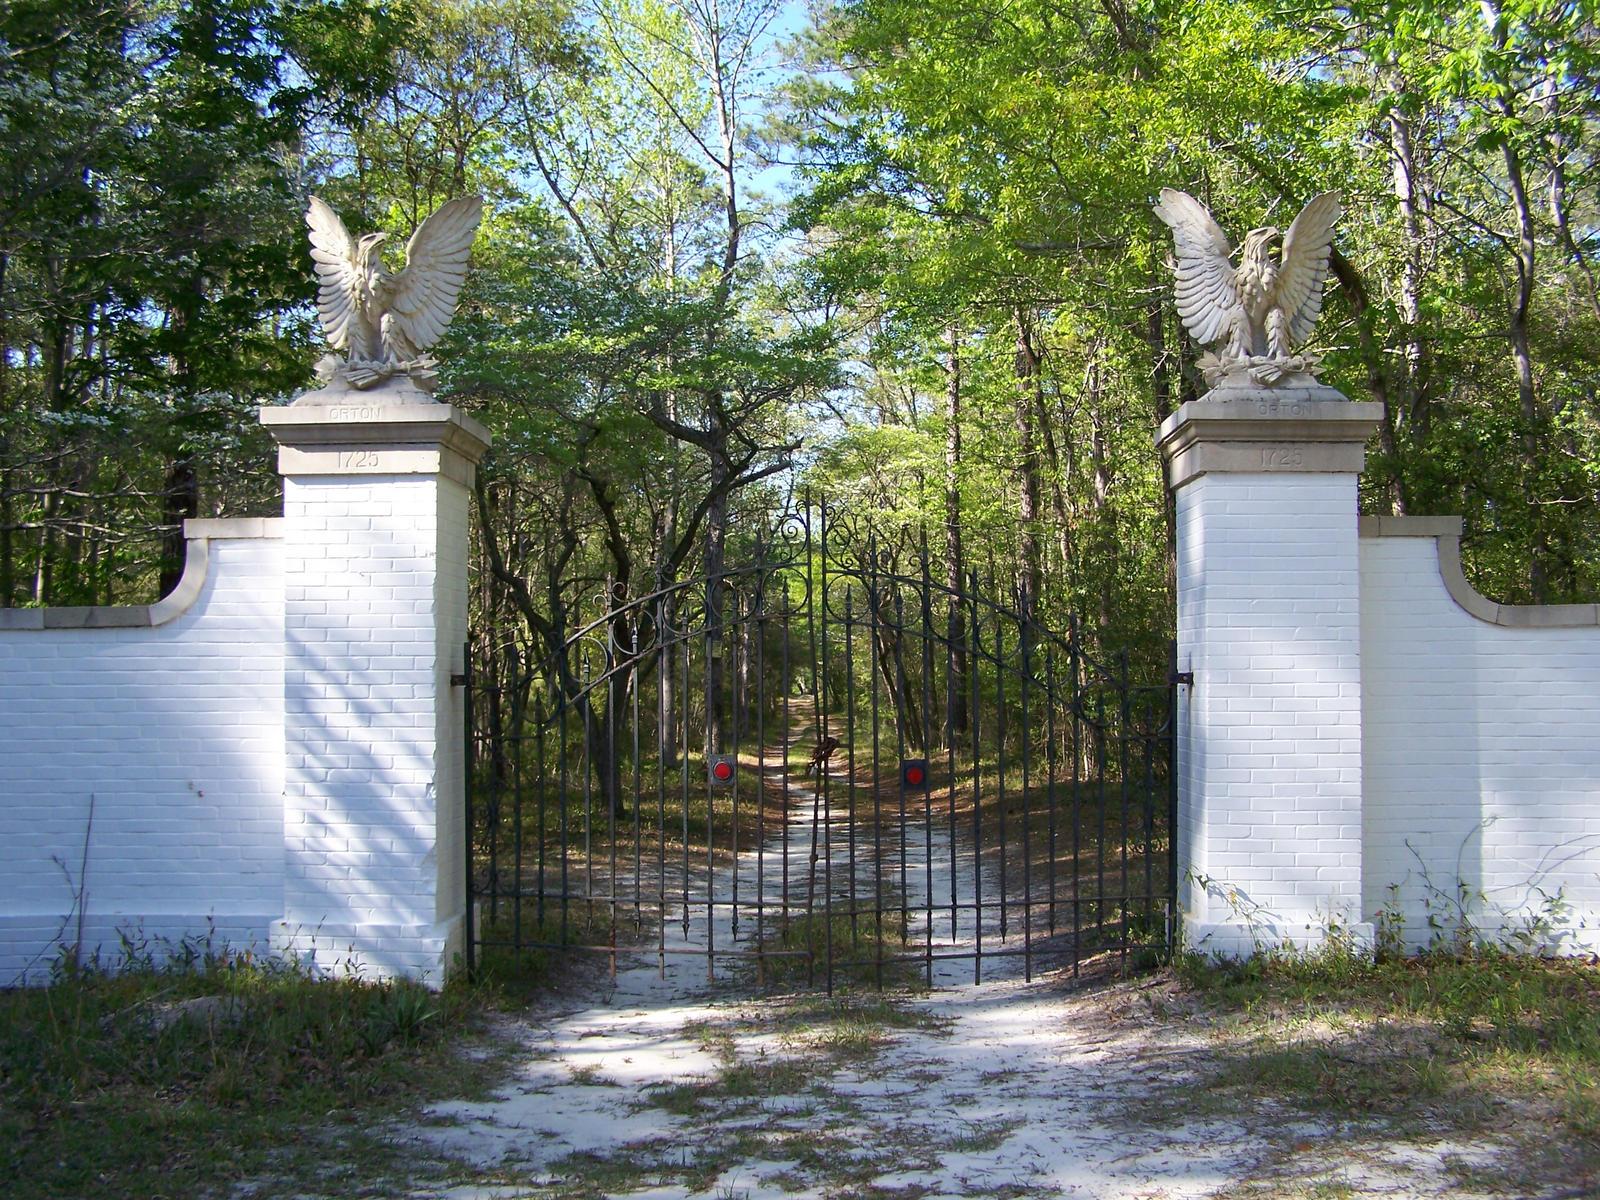 Orton Gates 2 by seiyastock